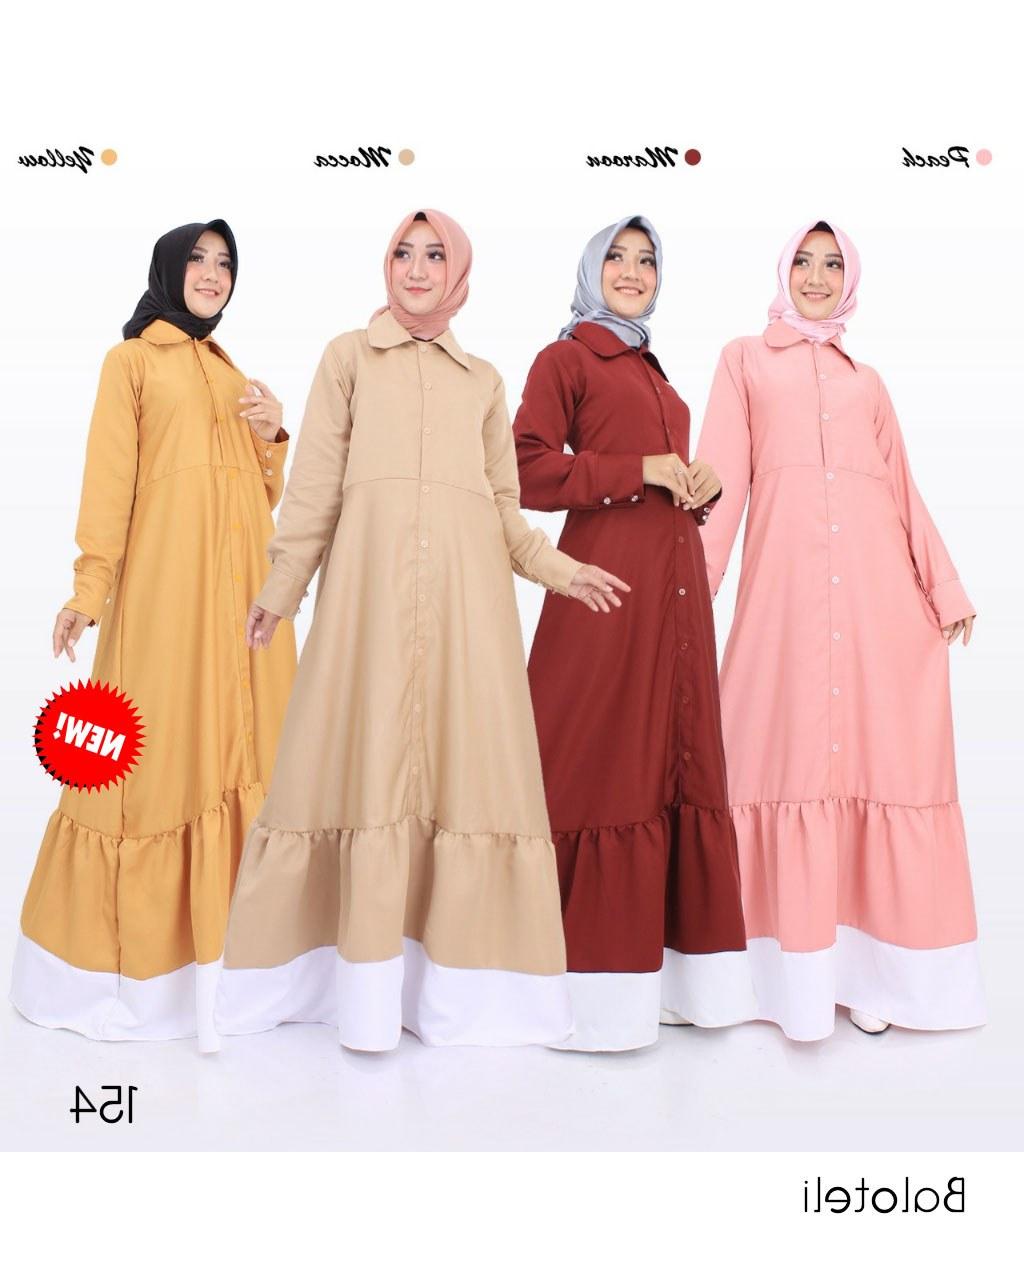 Inspirasi Model Baju Lebaran 2018 Tanah Abang O2d5 Jual Baju Gamis Tanpa Khimar Baloteli Polos G154 Tanah